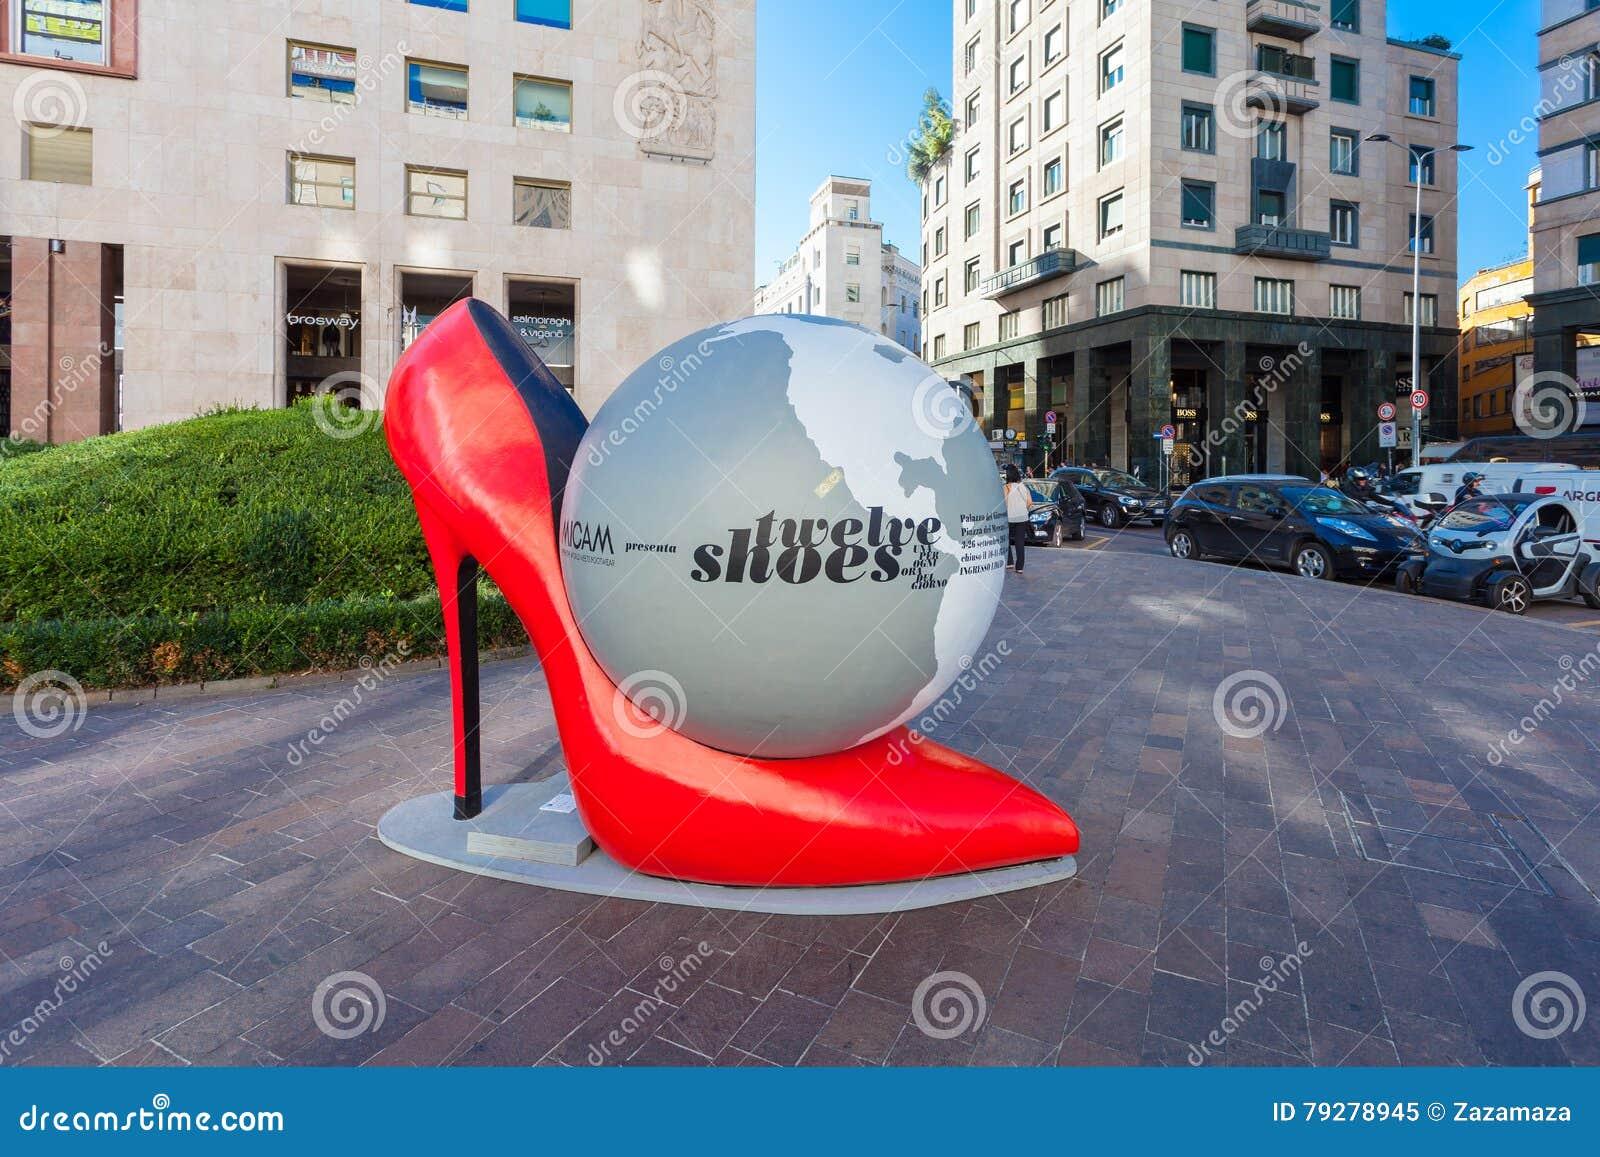 6 Septembre Des Chaussures MilanItalie 2016Installation oerCxdB